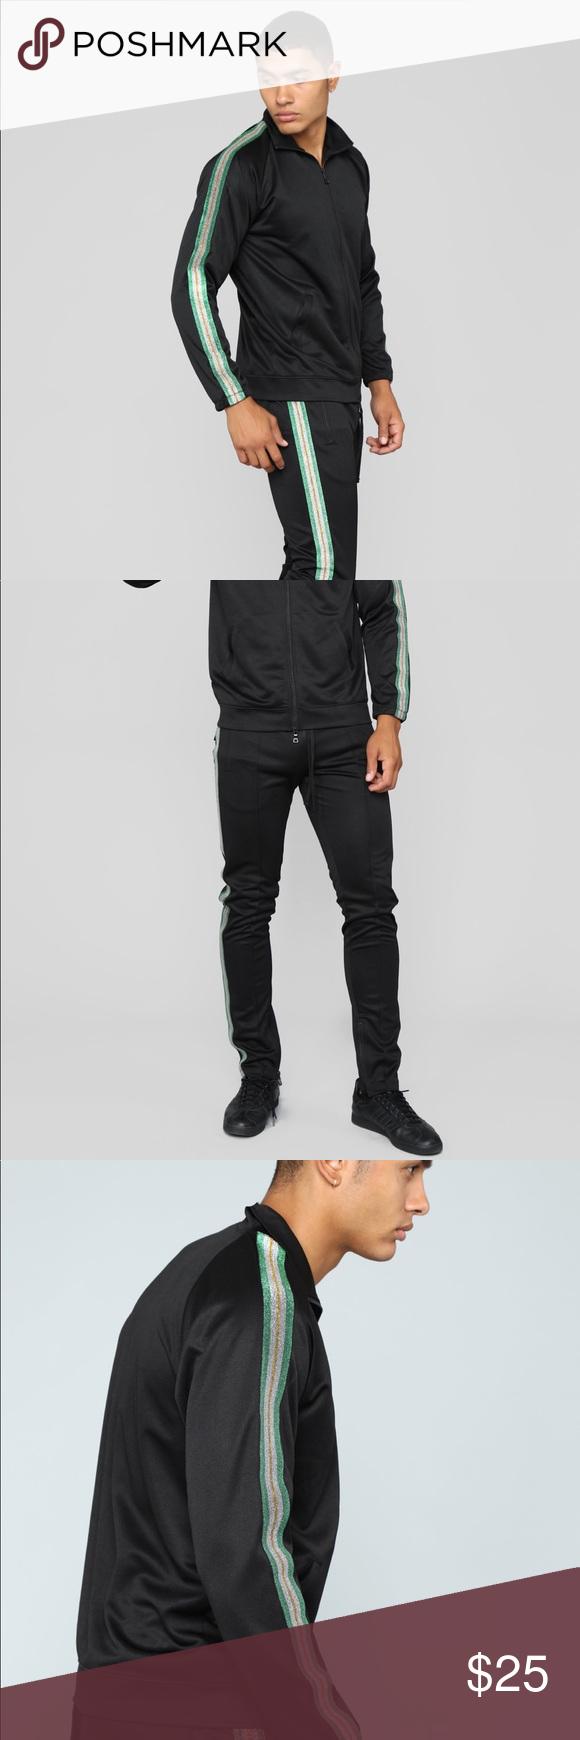 Bada Track Suit Set Includes Jacket And Pants Brand New Never Worn Tags On Fashion Nova Pants Sweatpants Joggers Tracksuit